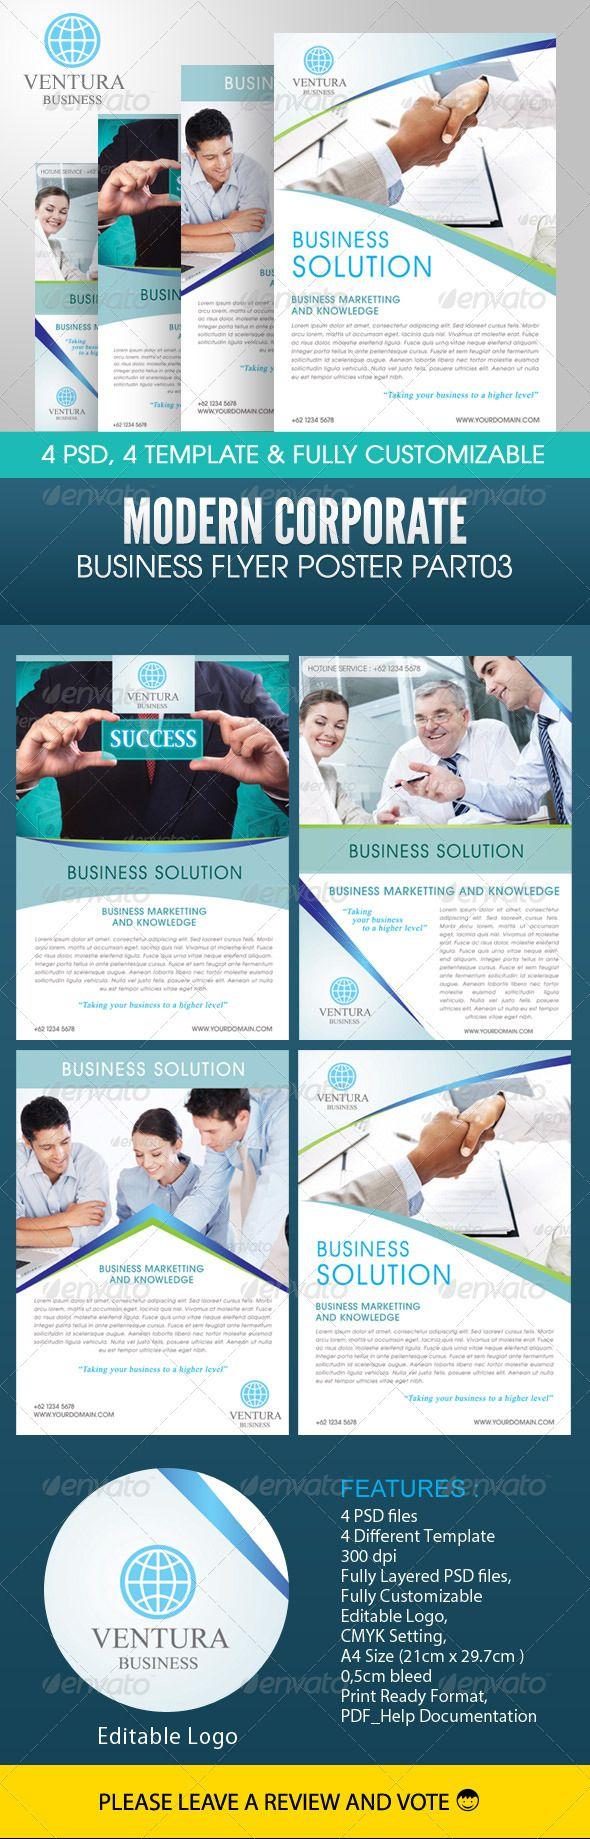 best images about brochure design business flyer modern corporate business flyer poster part 03